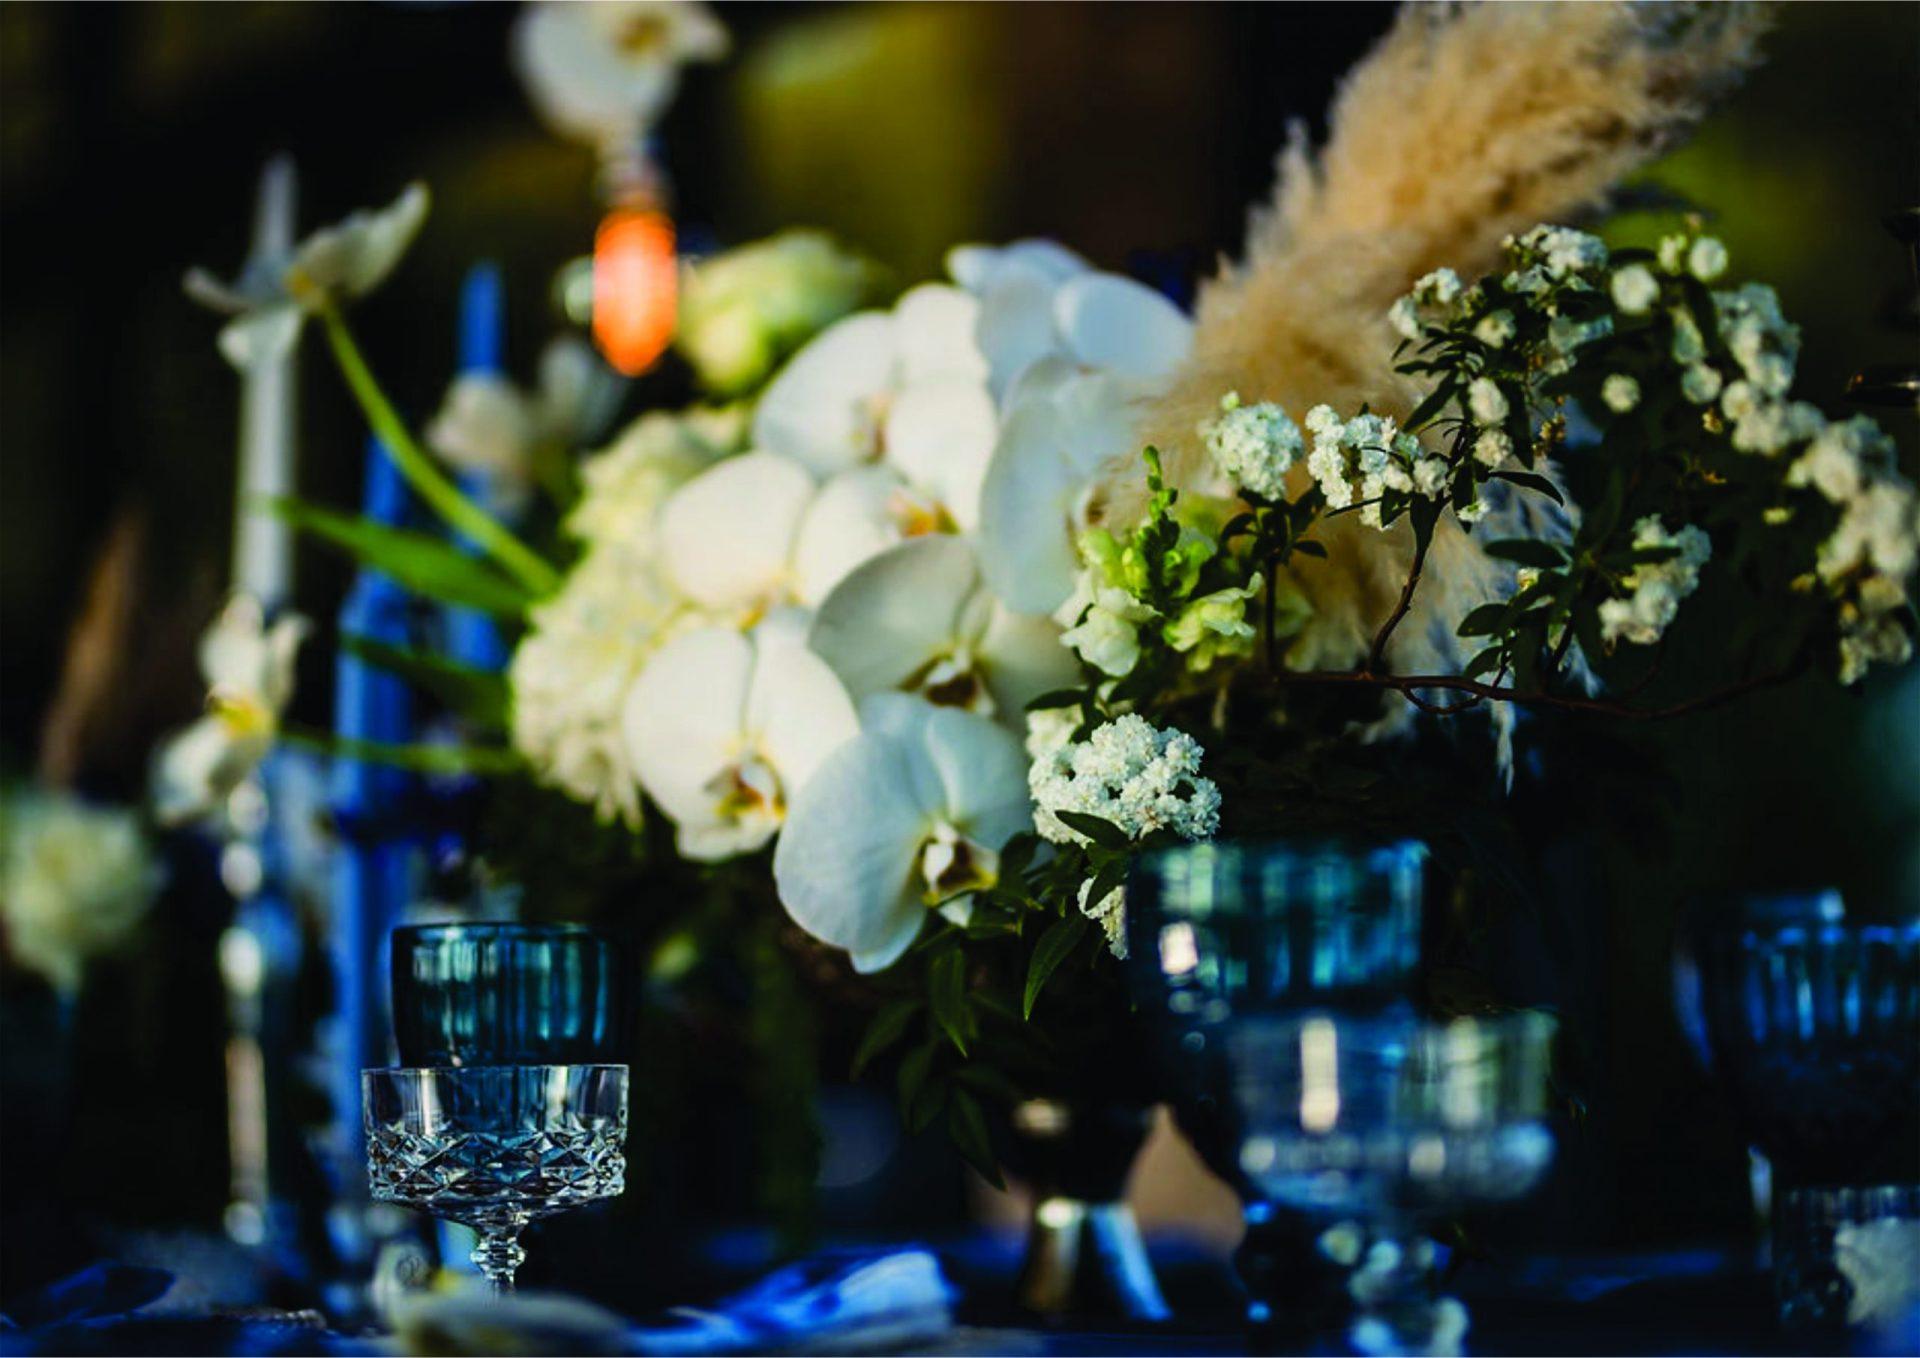 Bruidsgids Wedding Guide My Pretty Vintage Romantic Vineyard Setting Wedding Flowers Decor Events Photgraphy by Gustav Klotz